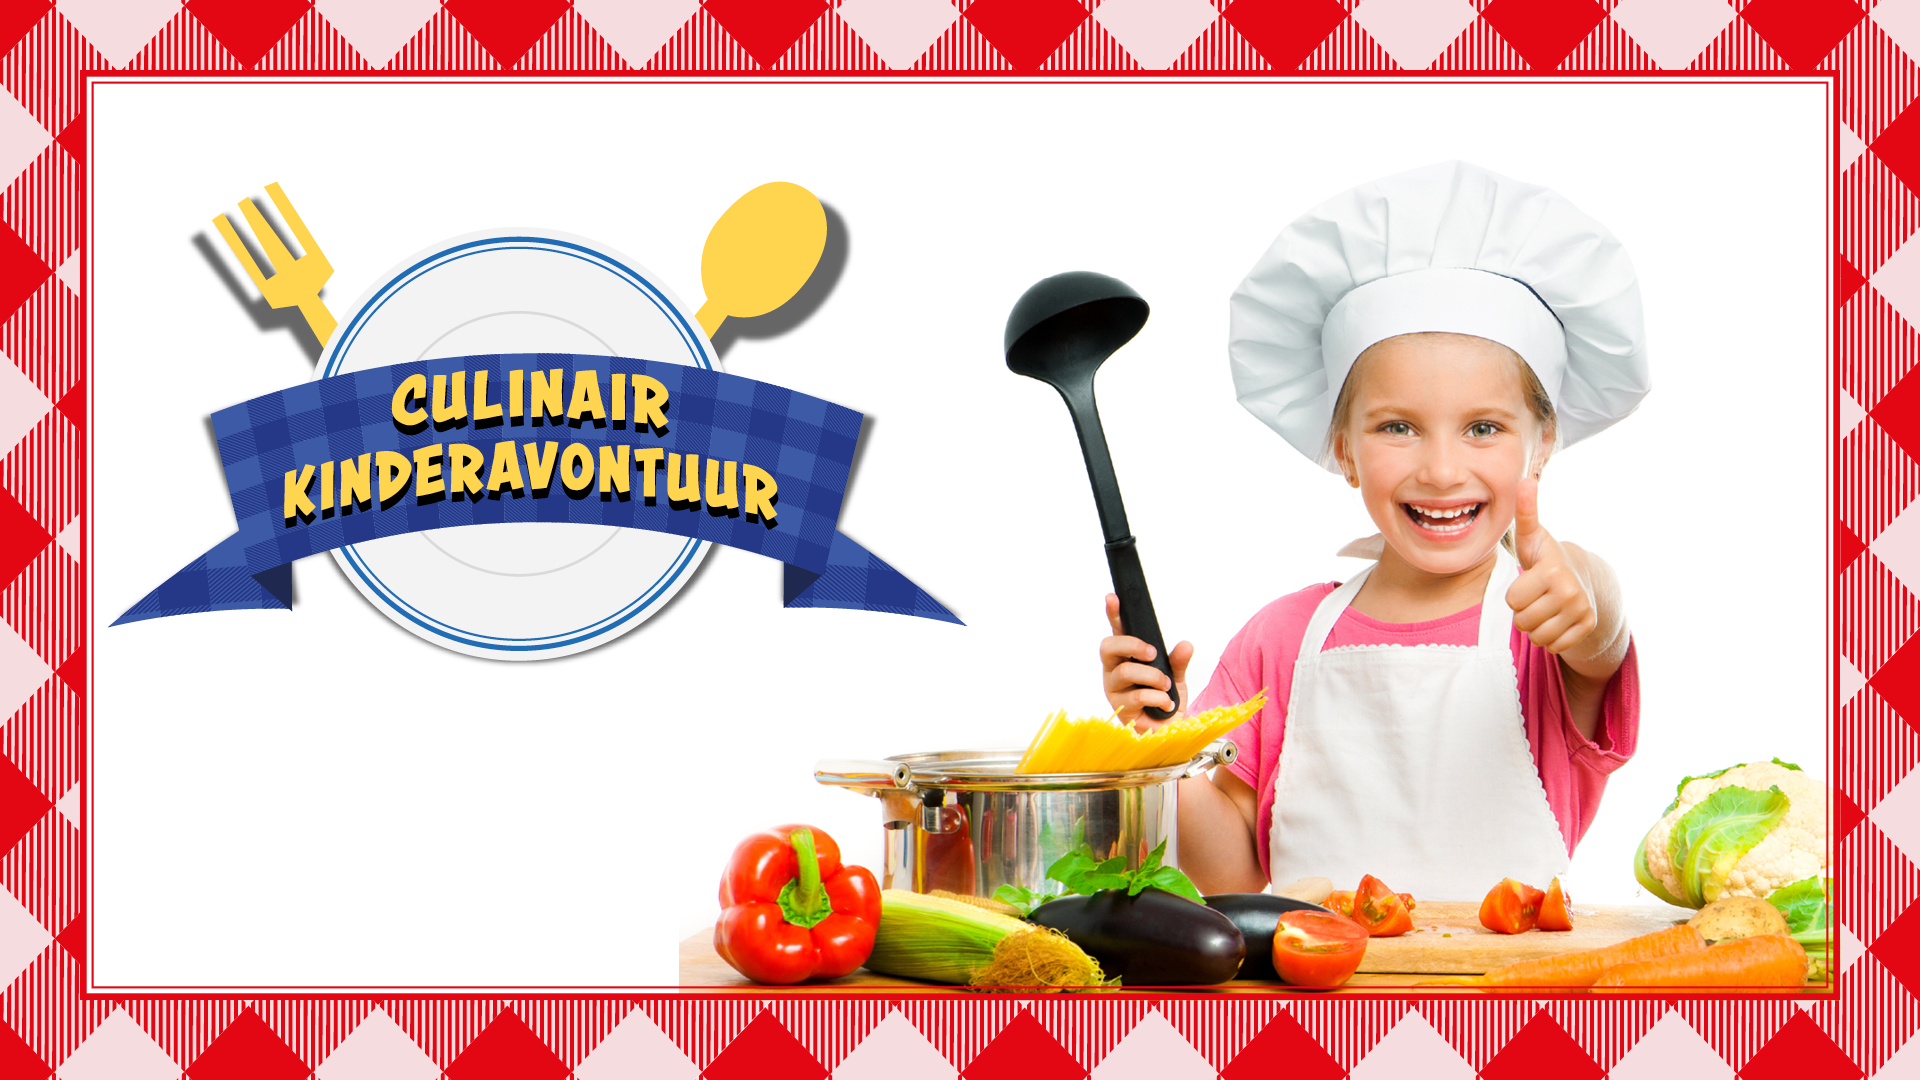 Culinair Kinderavontuur